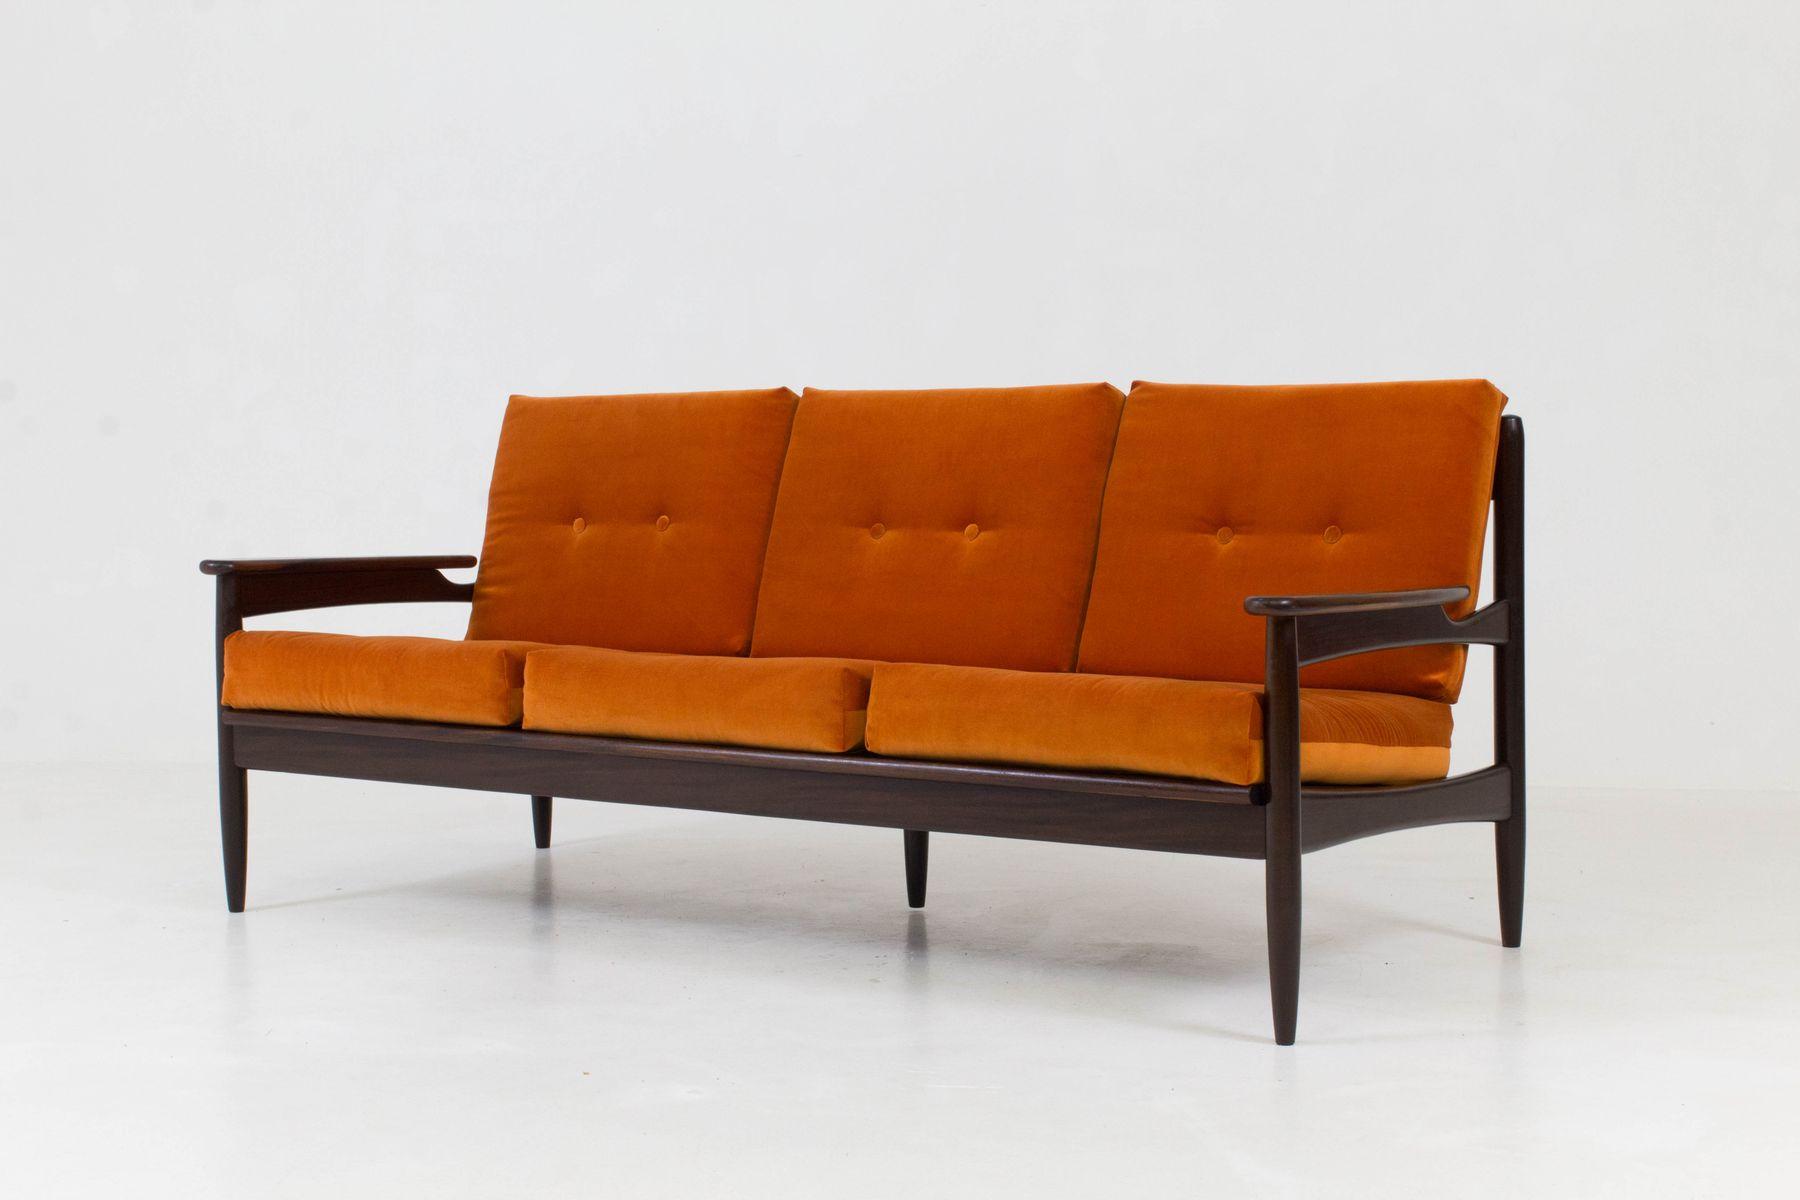 Perfect Mid Century Modern Danish Organic Sofa From Lifa, 1960s